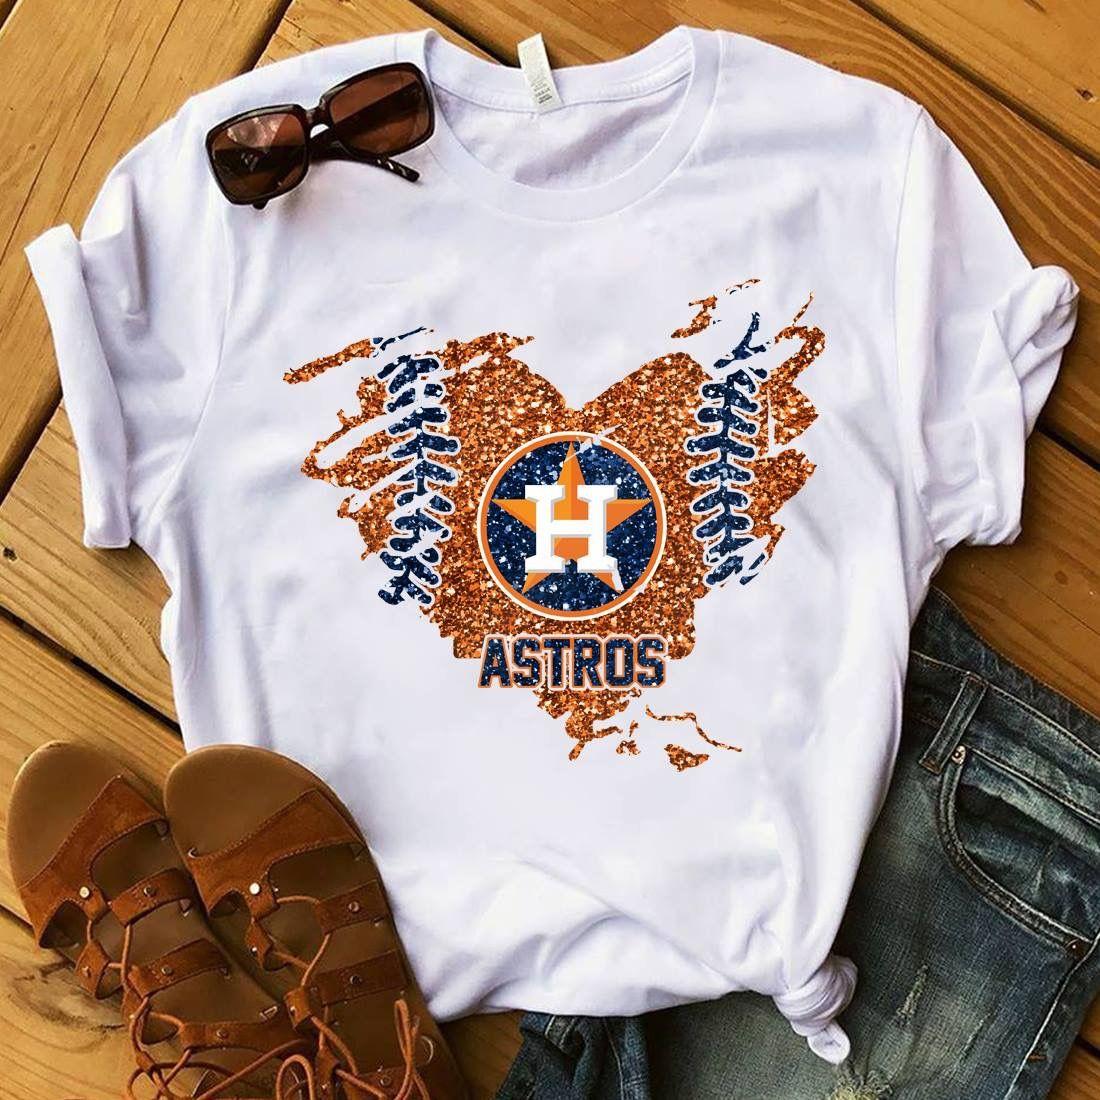 Astros Shirts >> Houston Astros Shirt Baseball T Shirt Designs Astros T